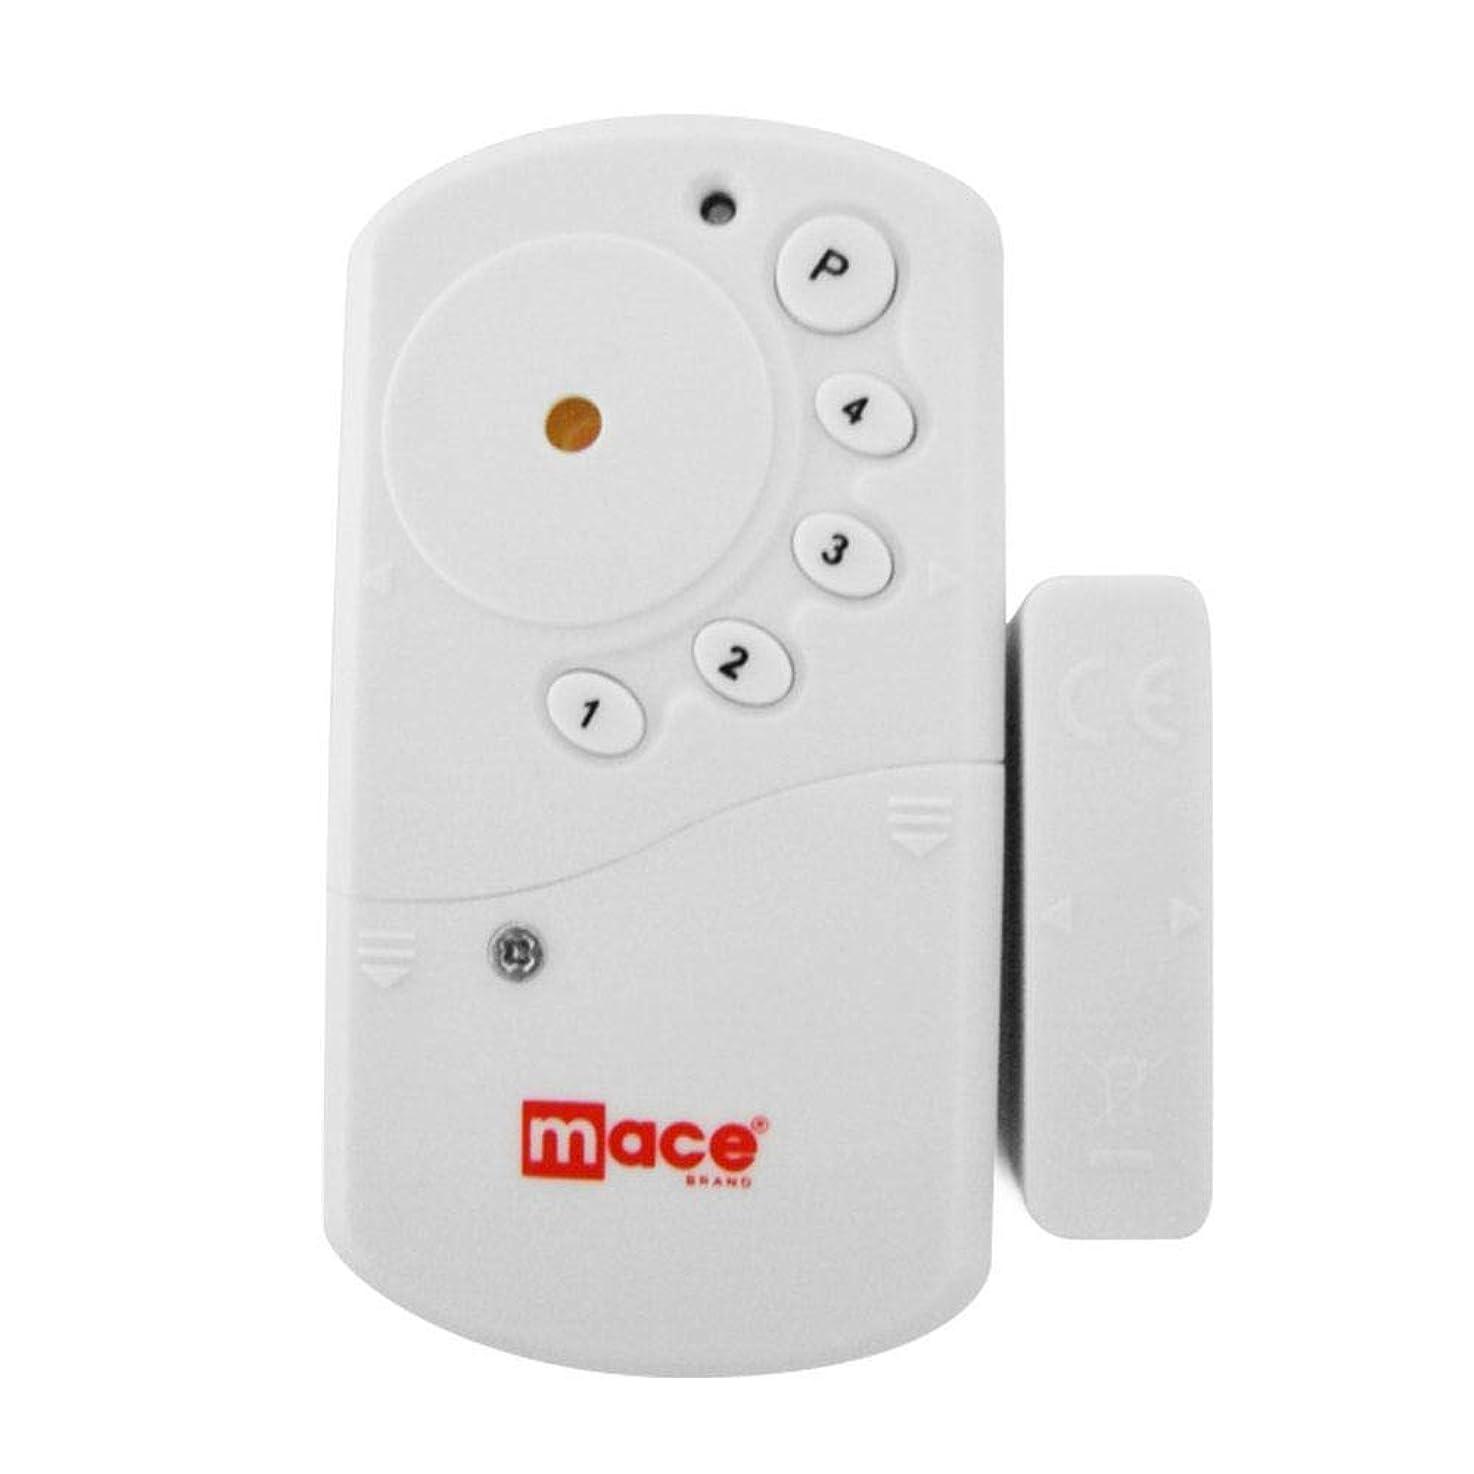 Wireless Digital Door/Window Burglar Alarm with Programmable Security Keypad by Mace